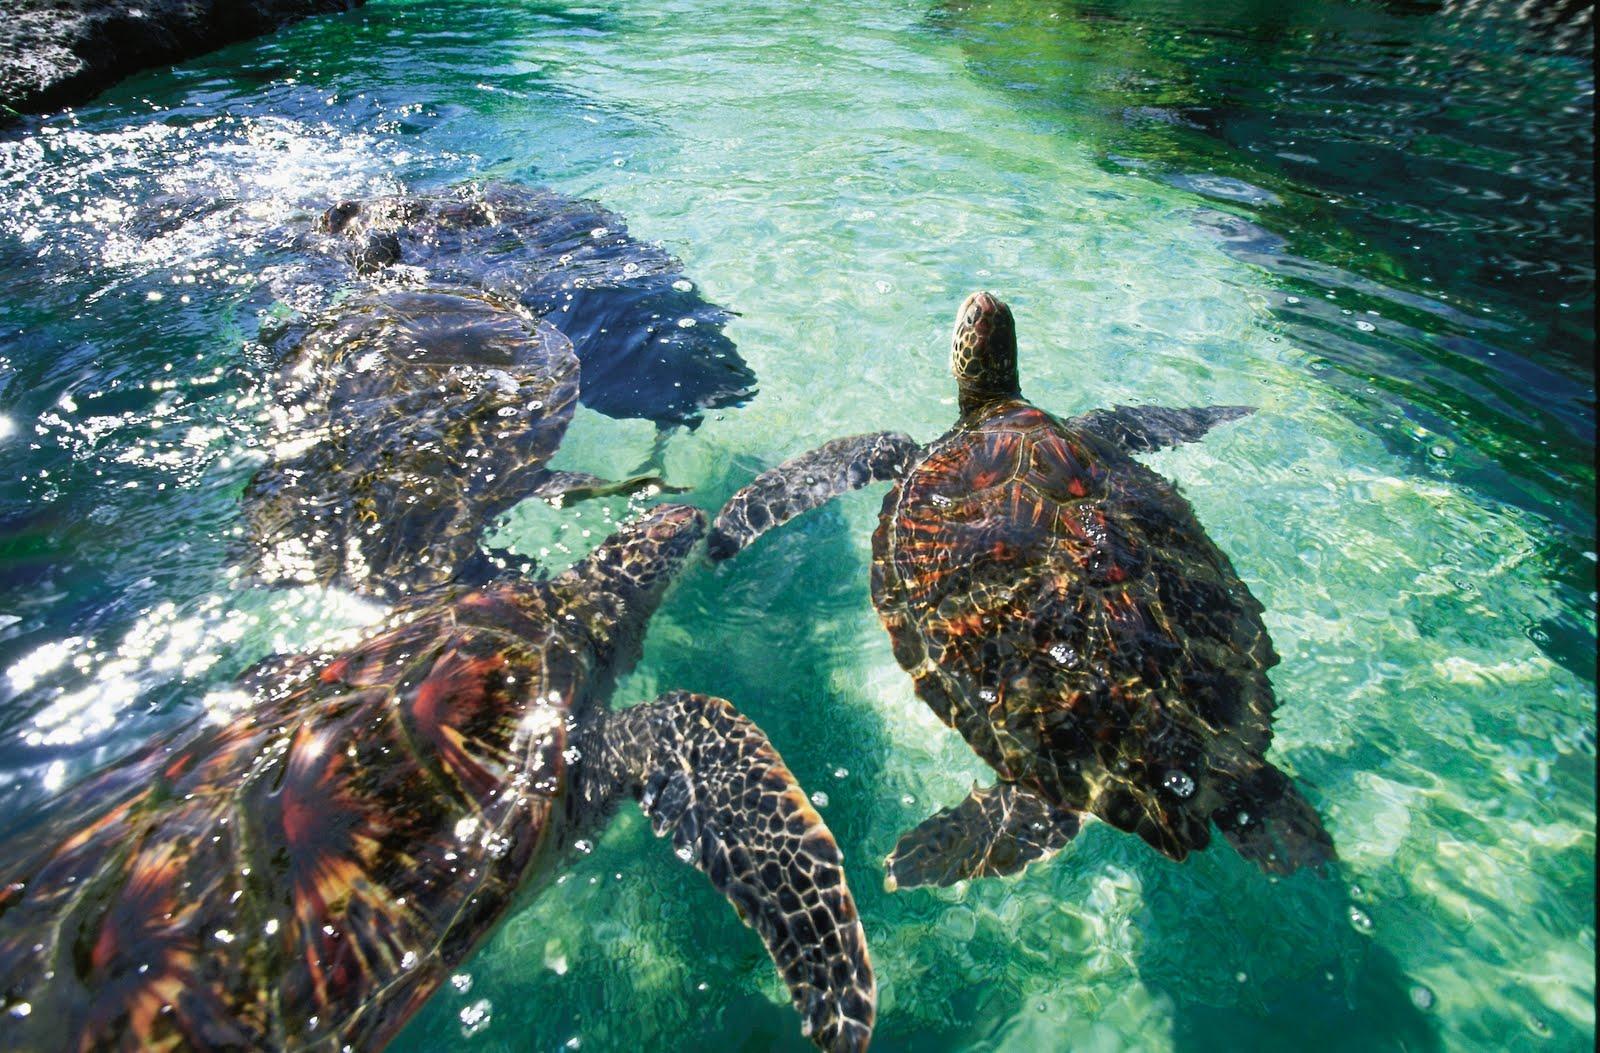 Top world travel destinations molokini crater maui hawaii